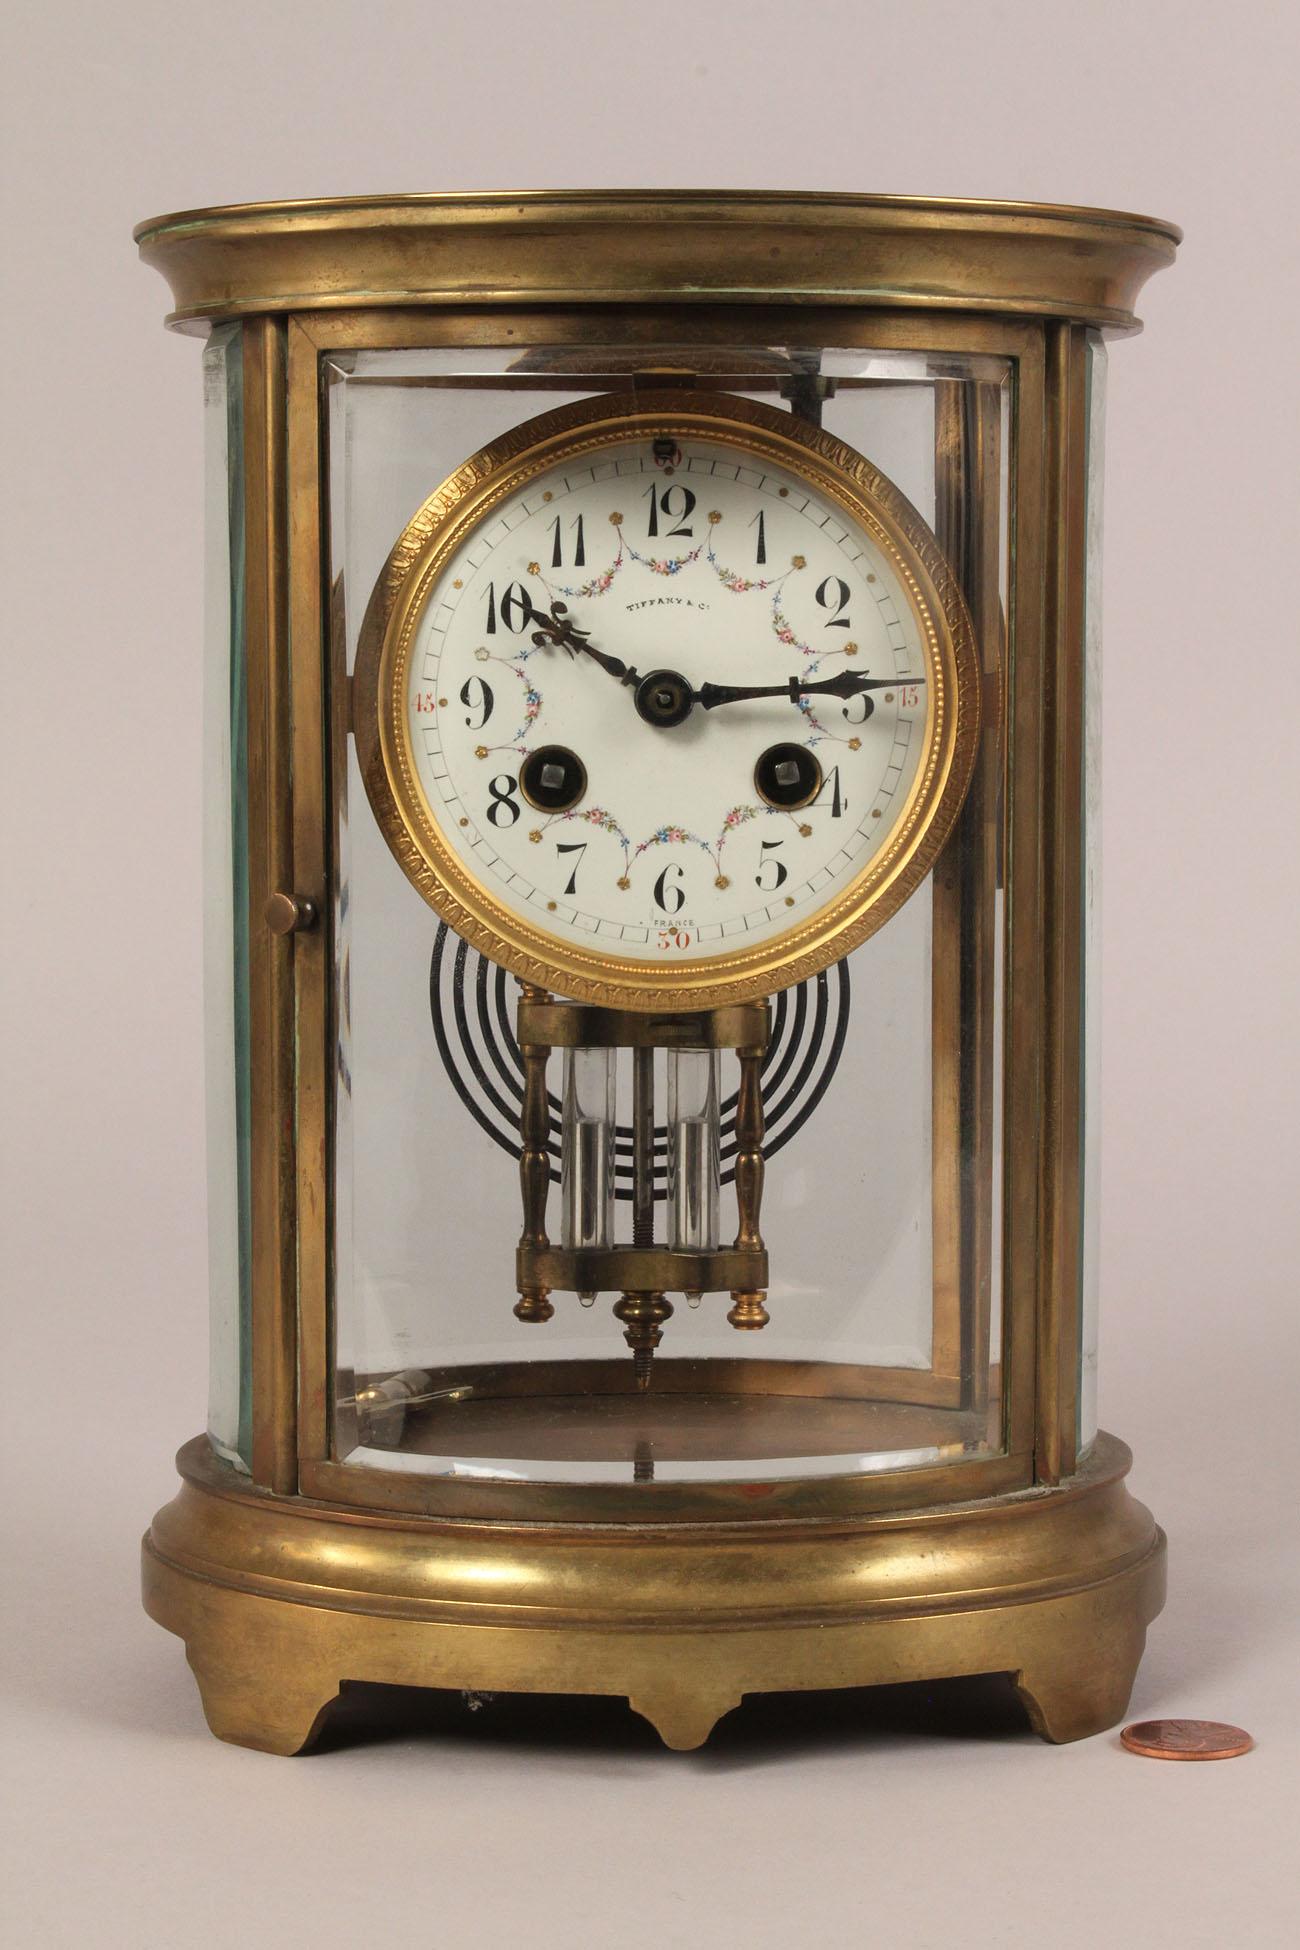 brass u0026 glass mantel clock - Mantel Clock